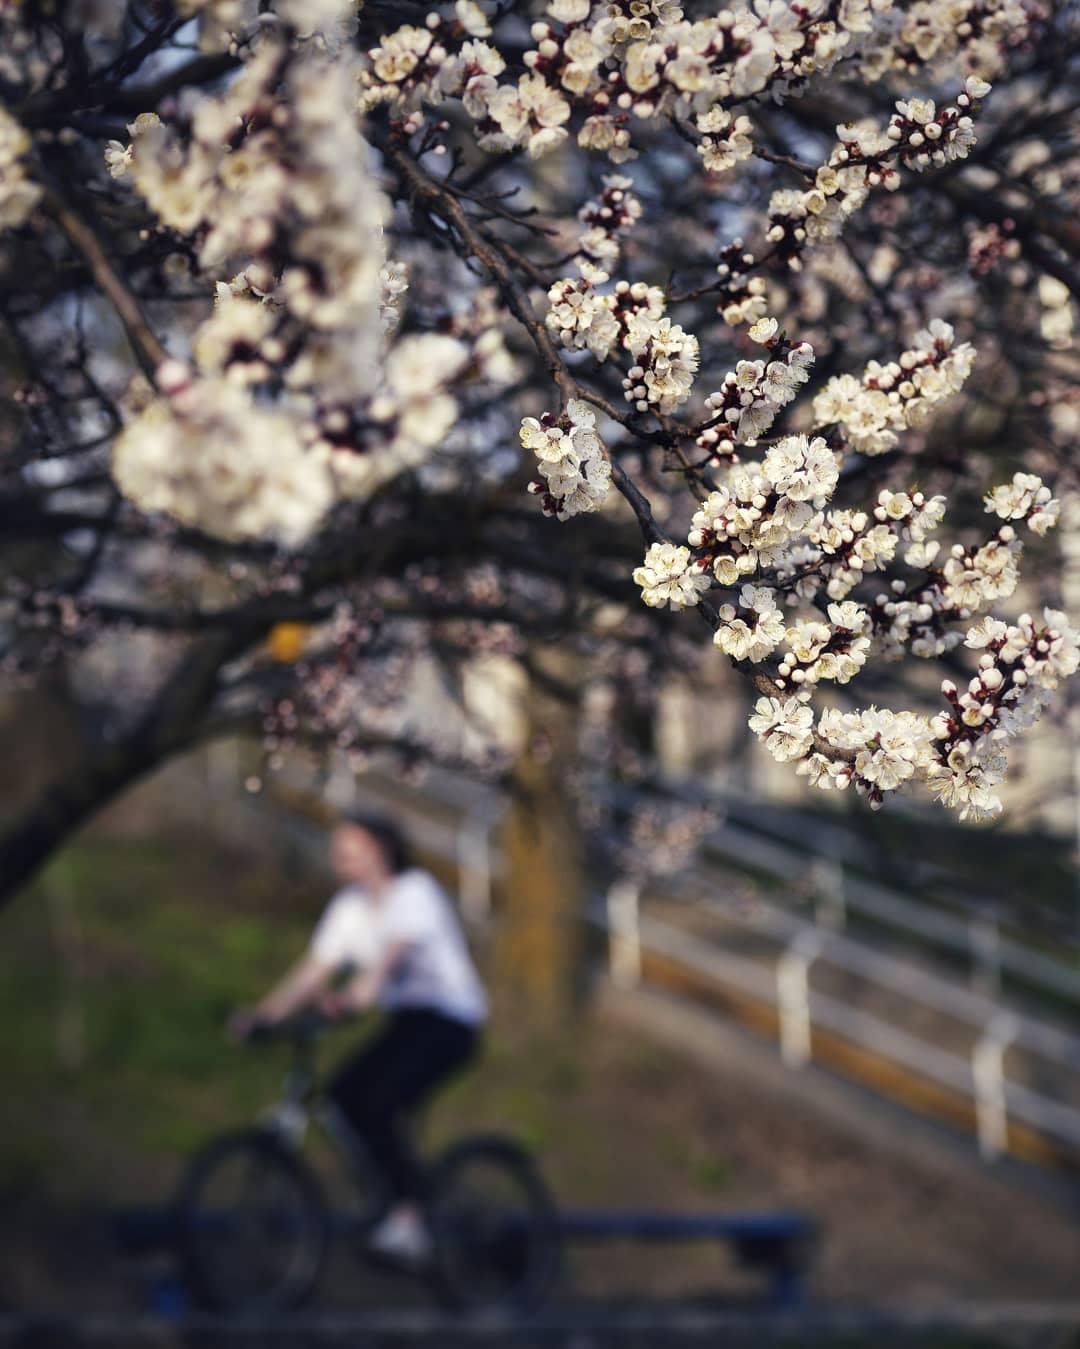 Почки деревьев мягко намекают, что весна пришла. Фото: @istetsen